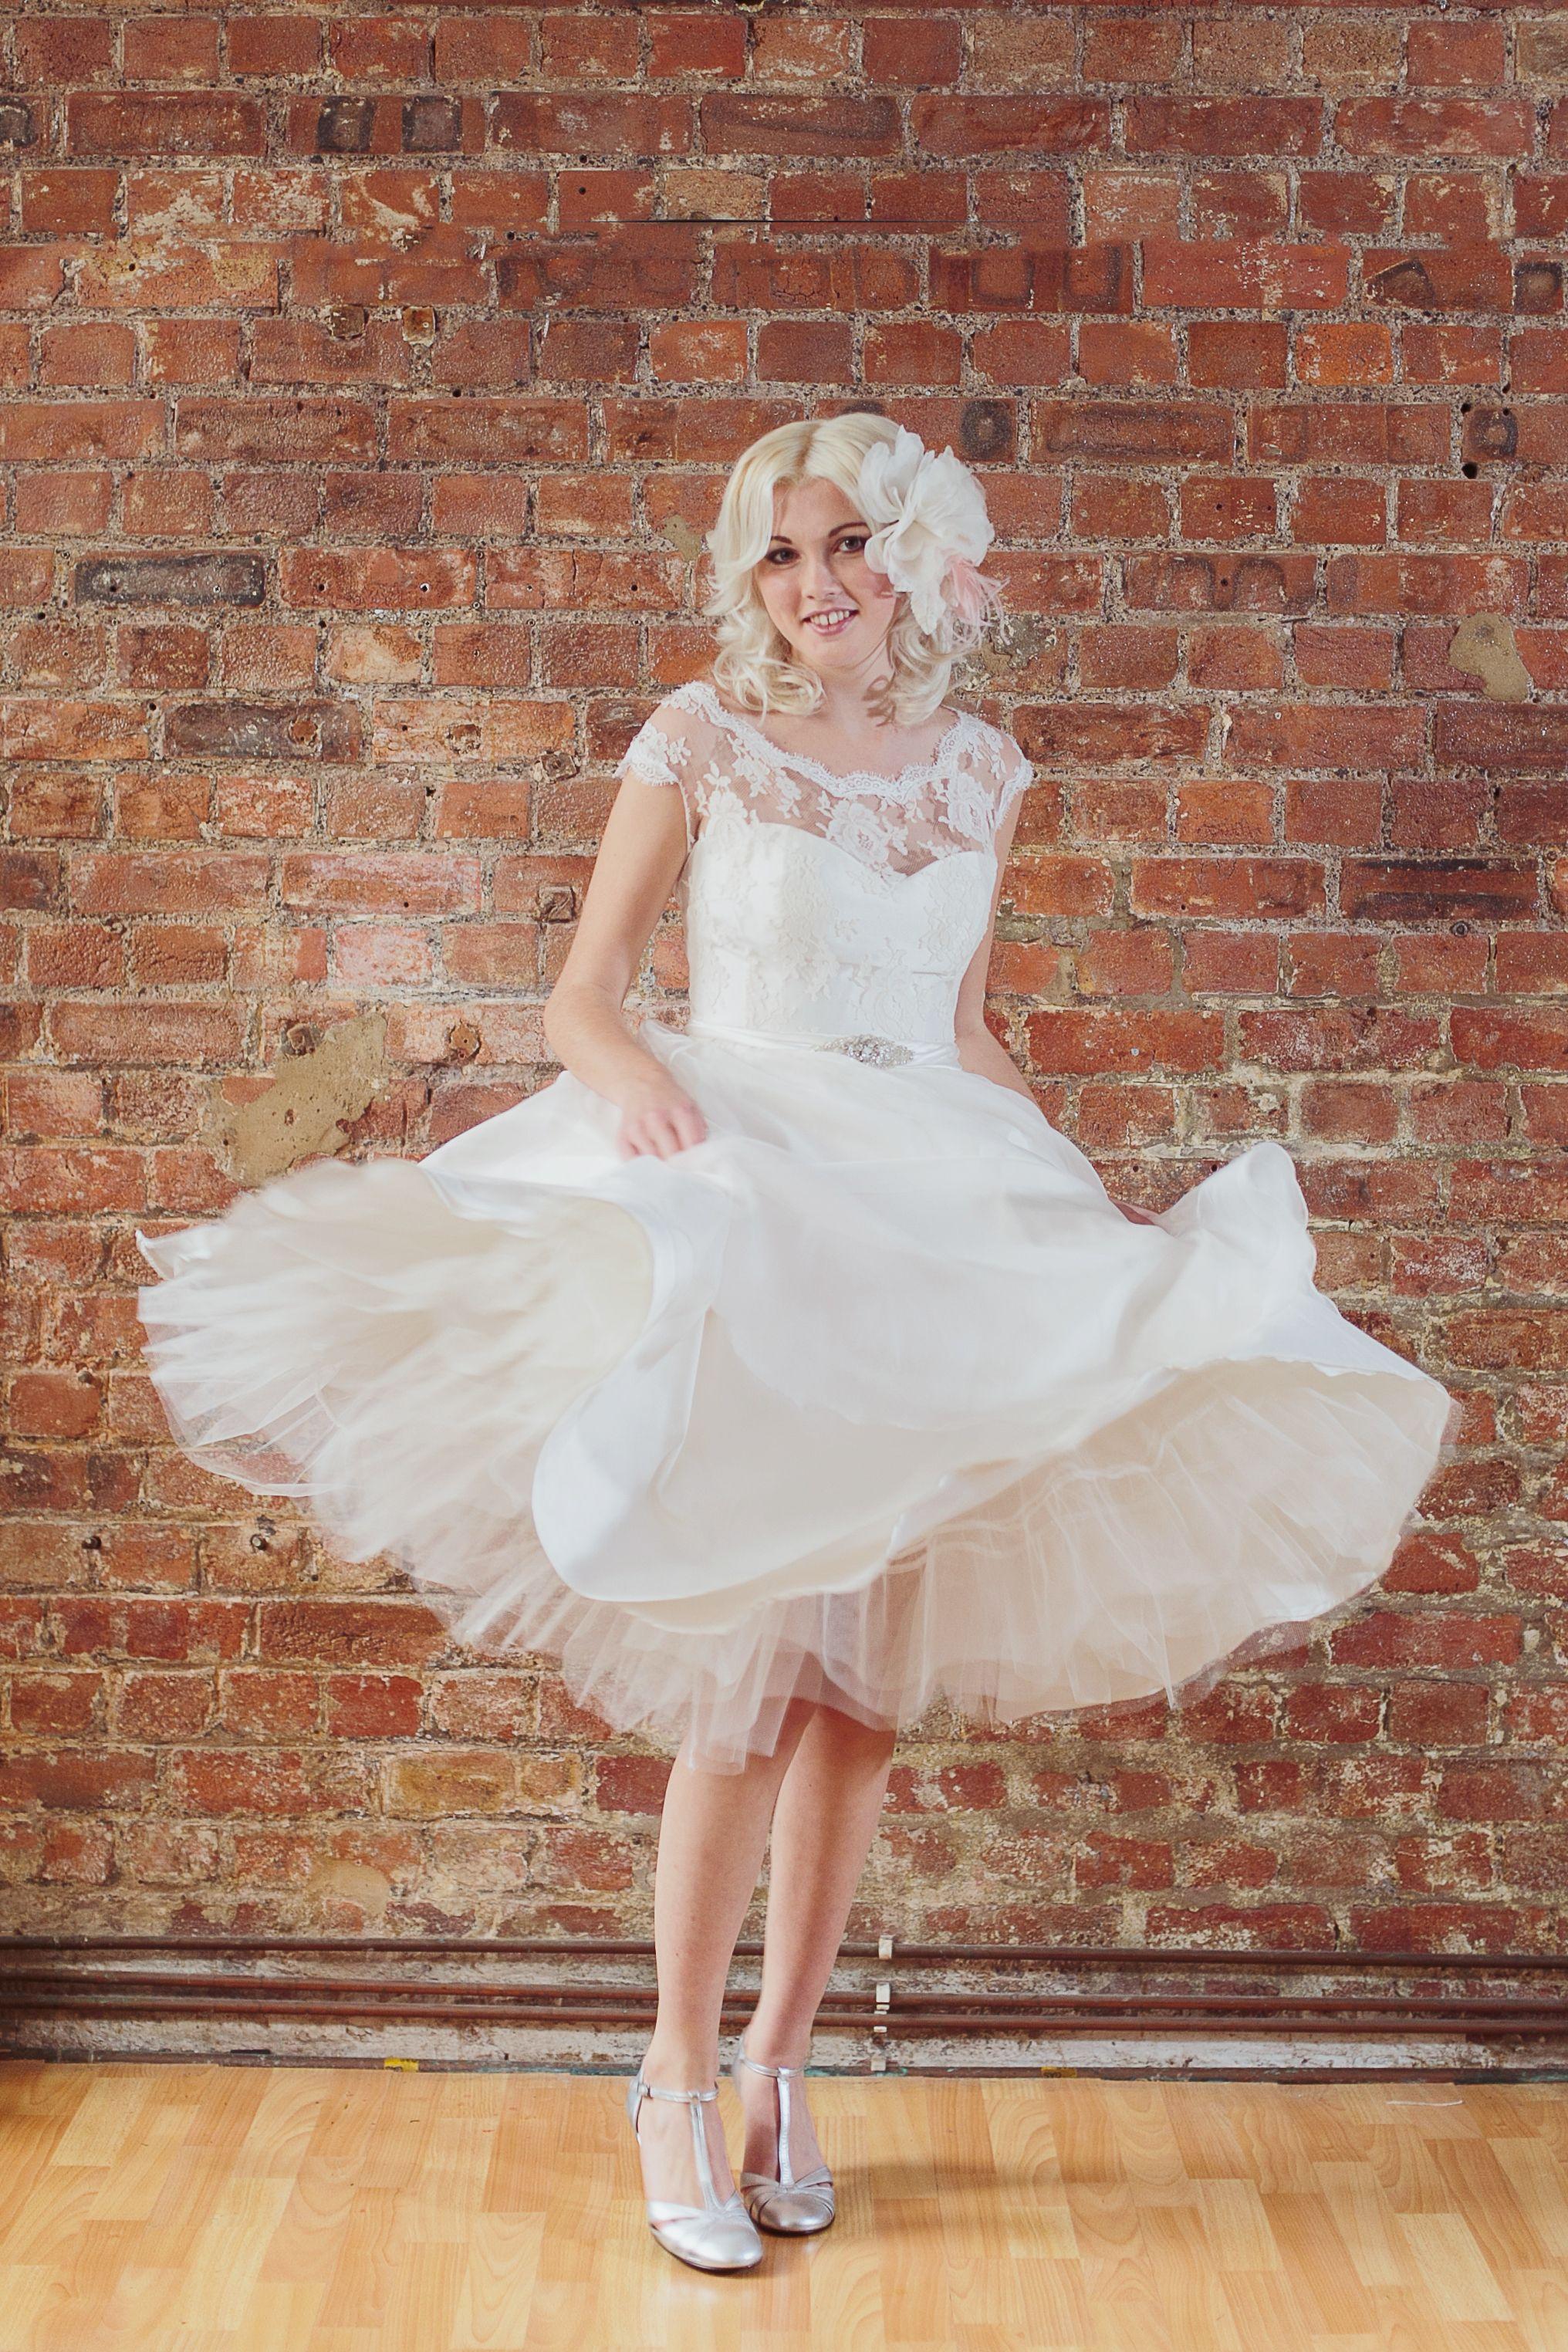 Fifties style wedding dress designed by dana bolton www fifties style wedding dress designed by dana bolton dressmakingdesign ombrellifo Gallery